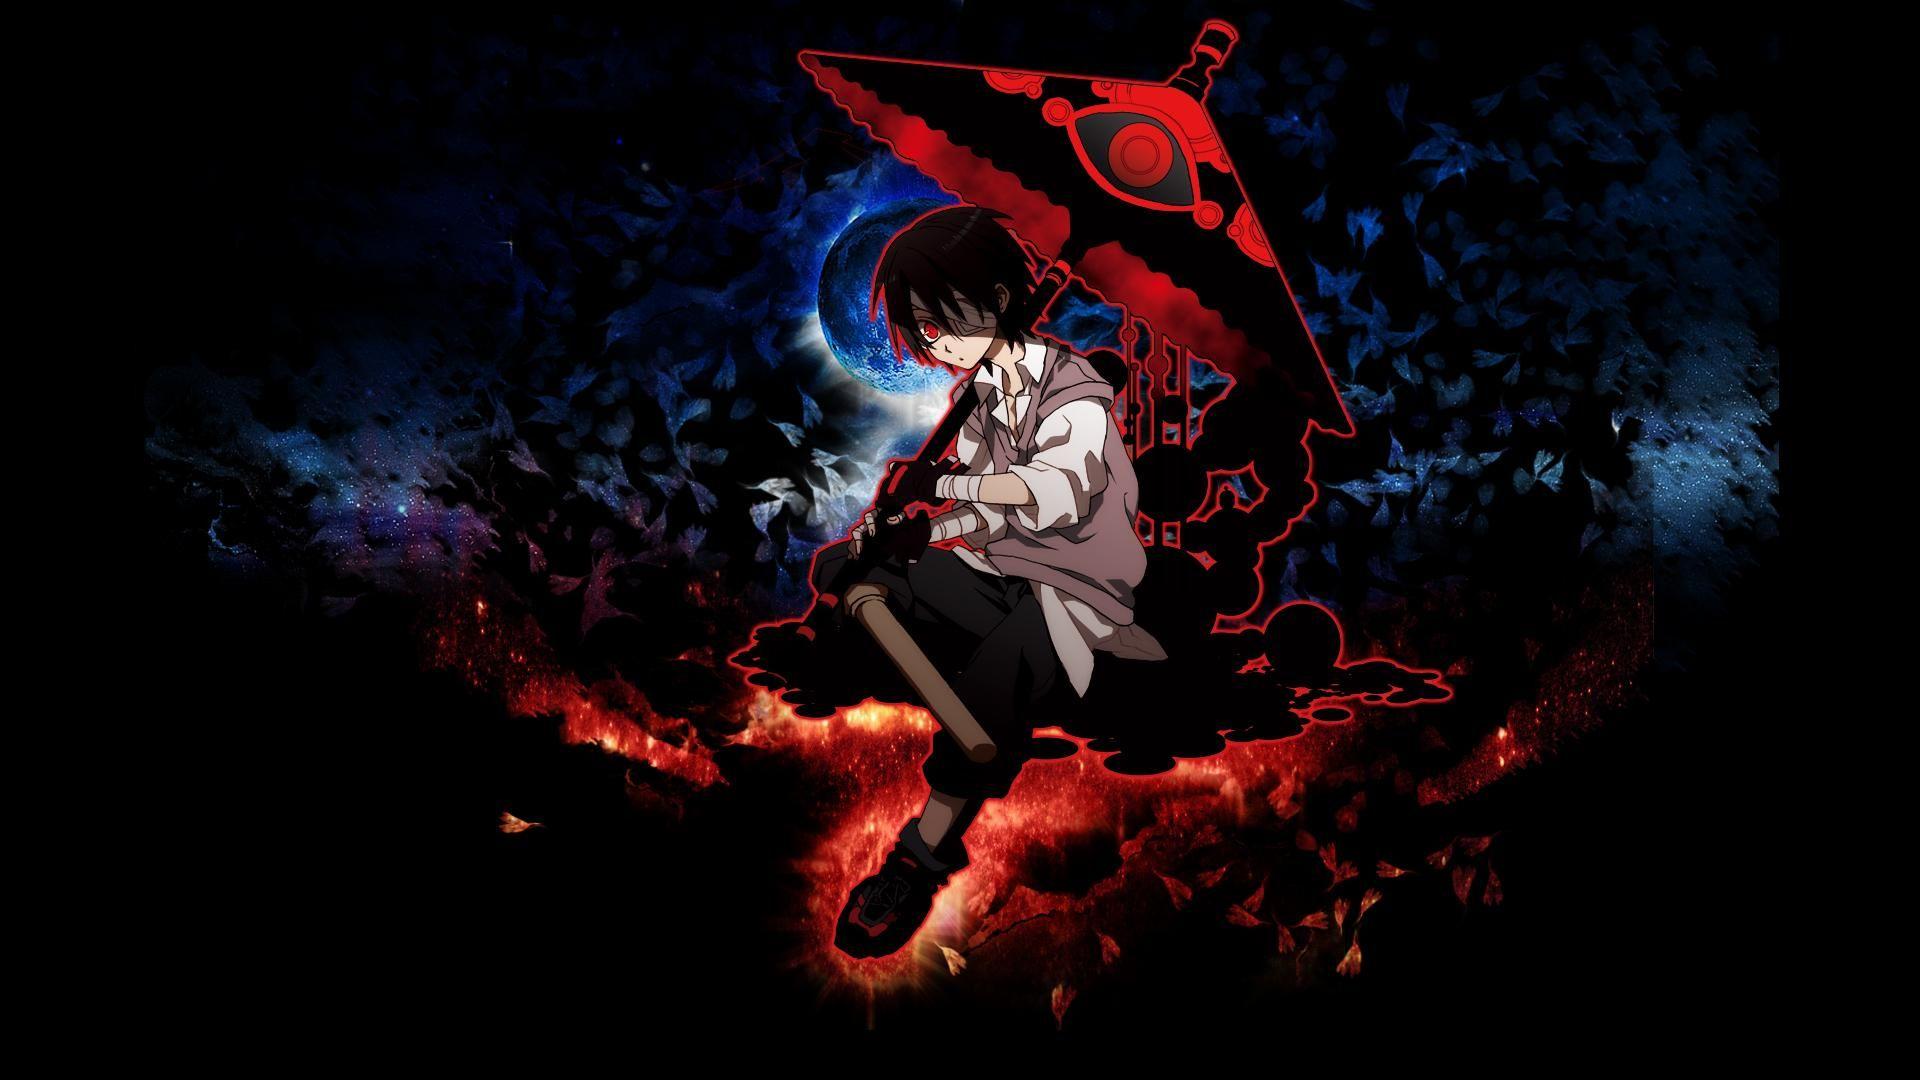 Cool Anime Wallpapers Hd 1920x1080 8 Anime Wallpaper 1920x1080 1080p Anime Wallpaper Anime Wallpaper Download